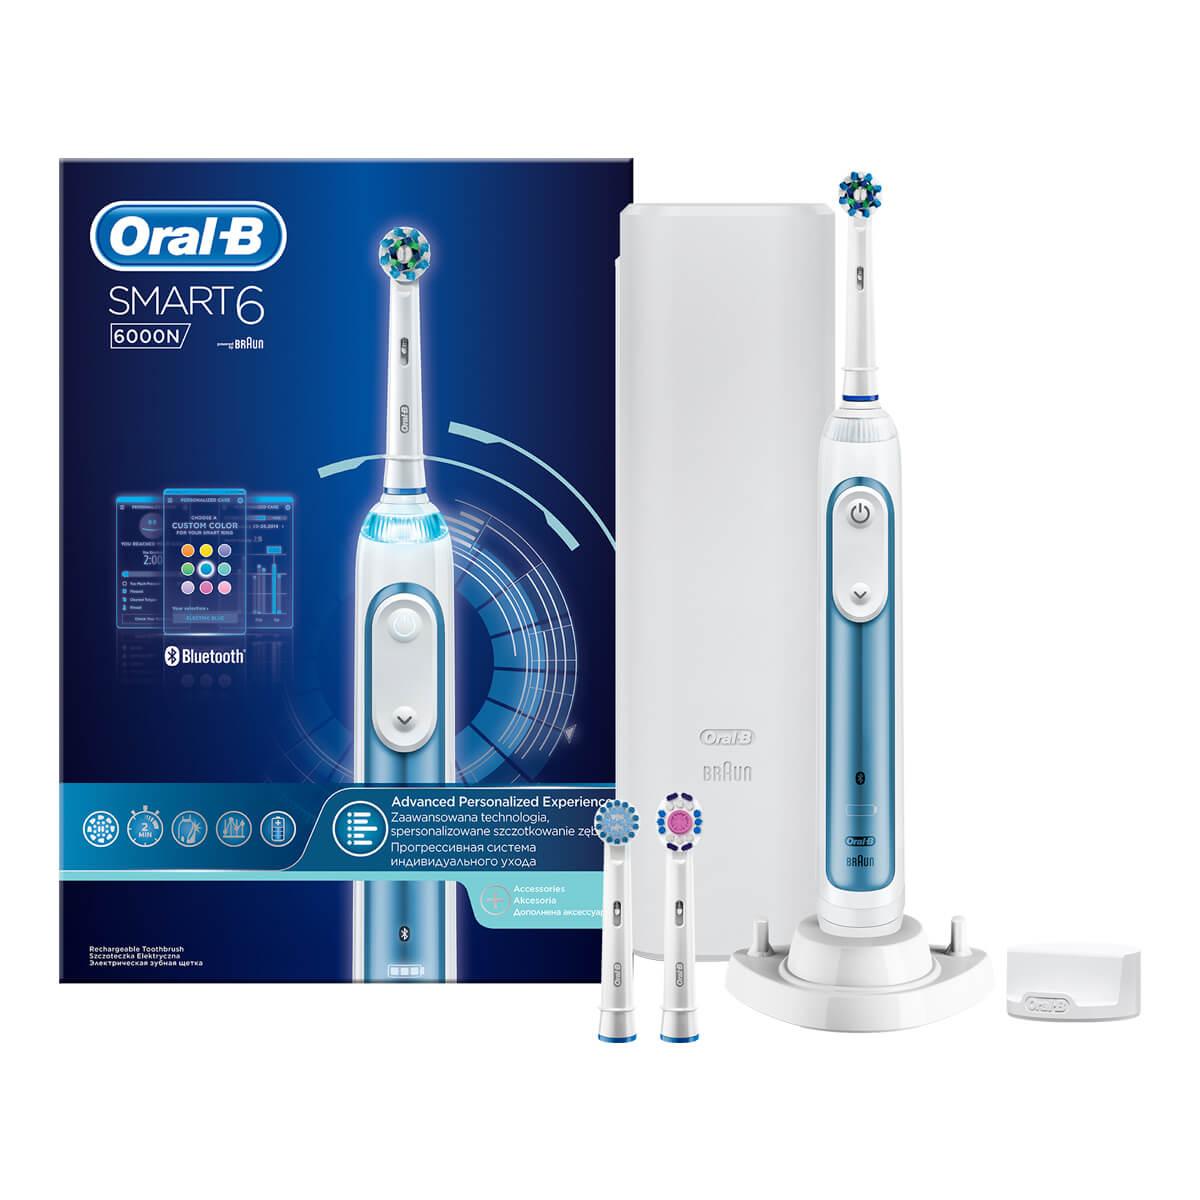 Oral-B Smart 6 6000N от Braun